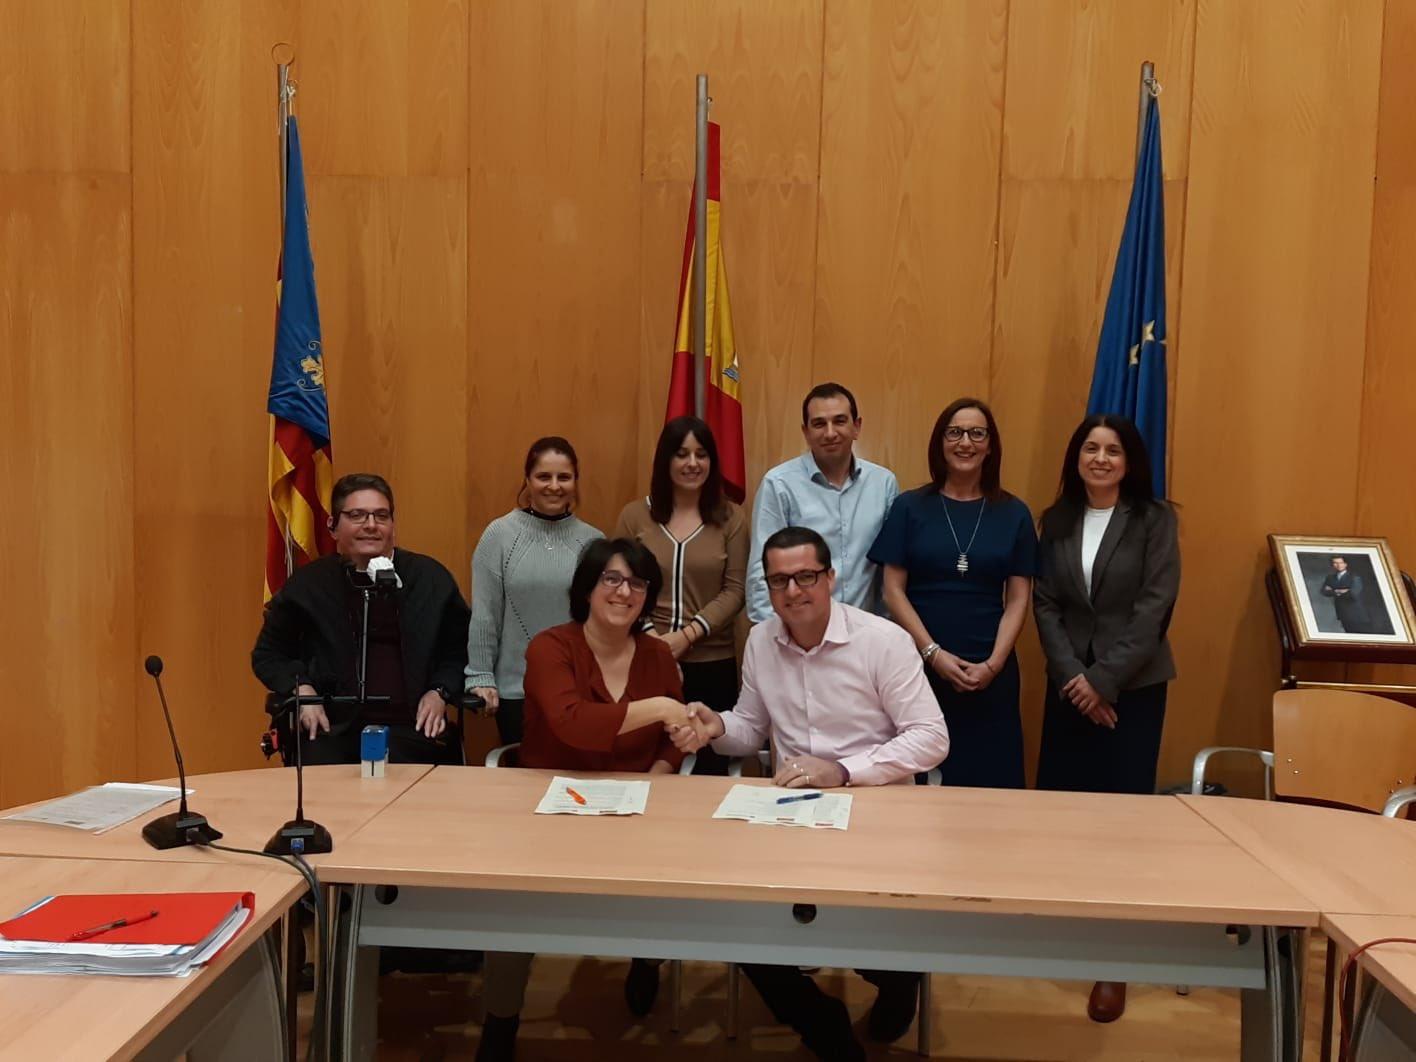 PSPV y Compromis pacto Bonrepòs i Mirambell